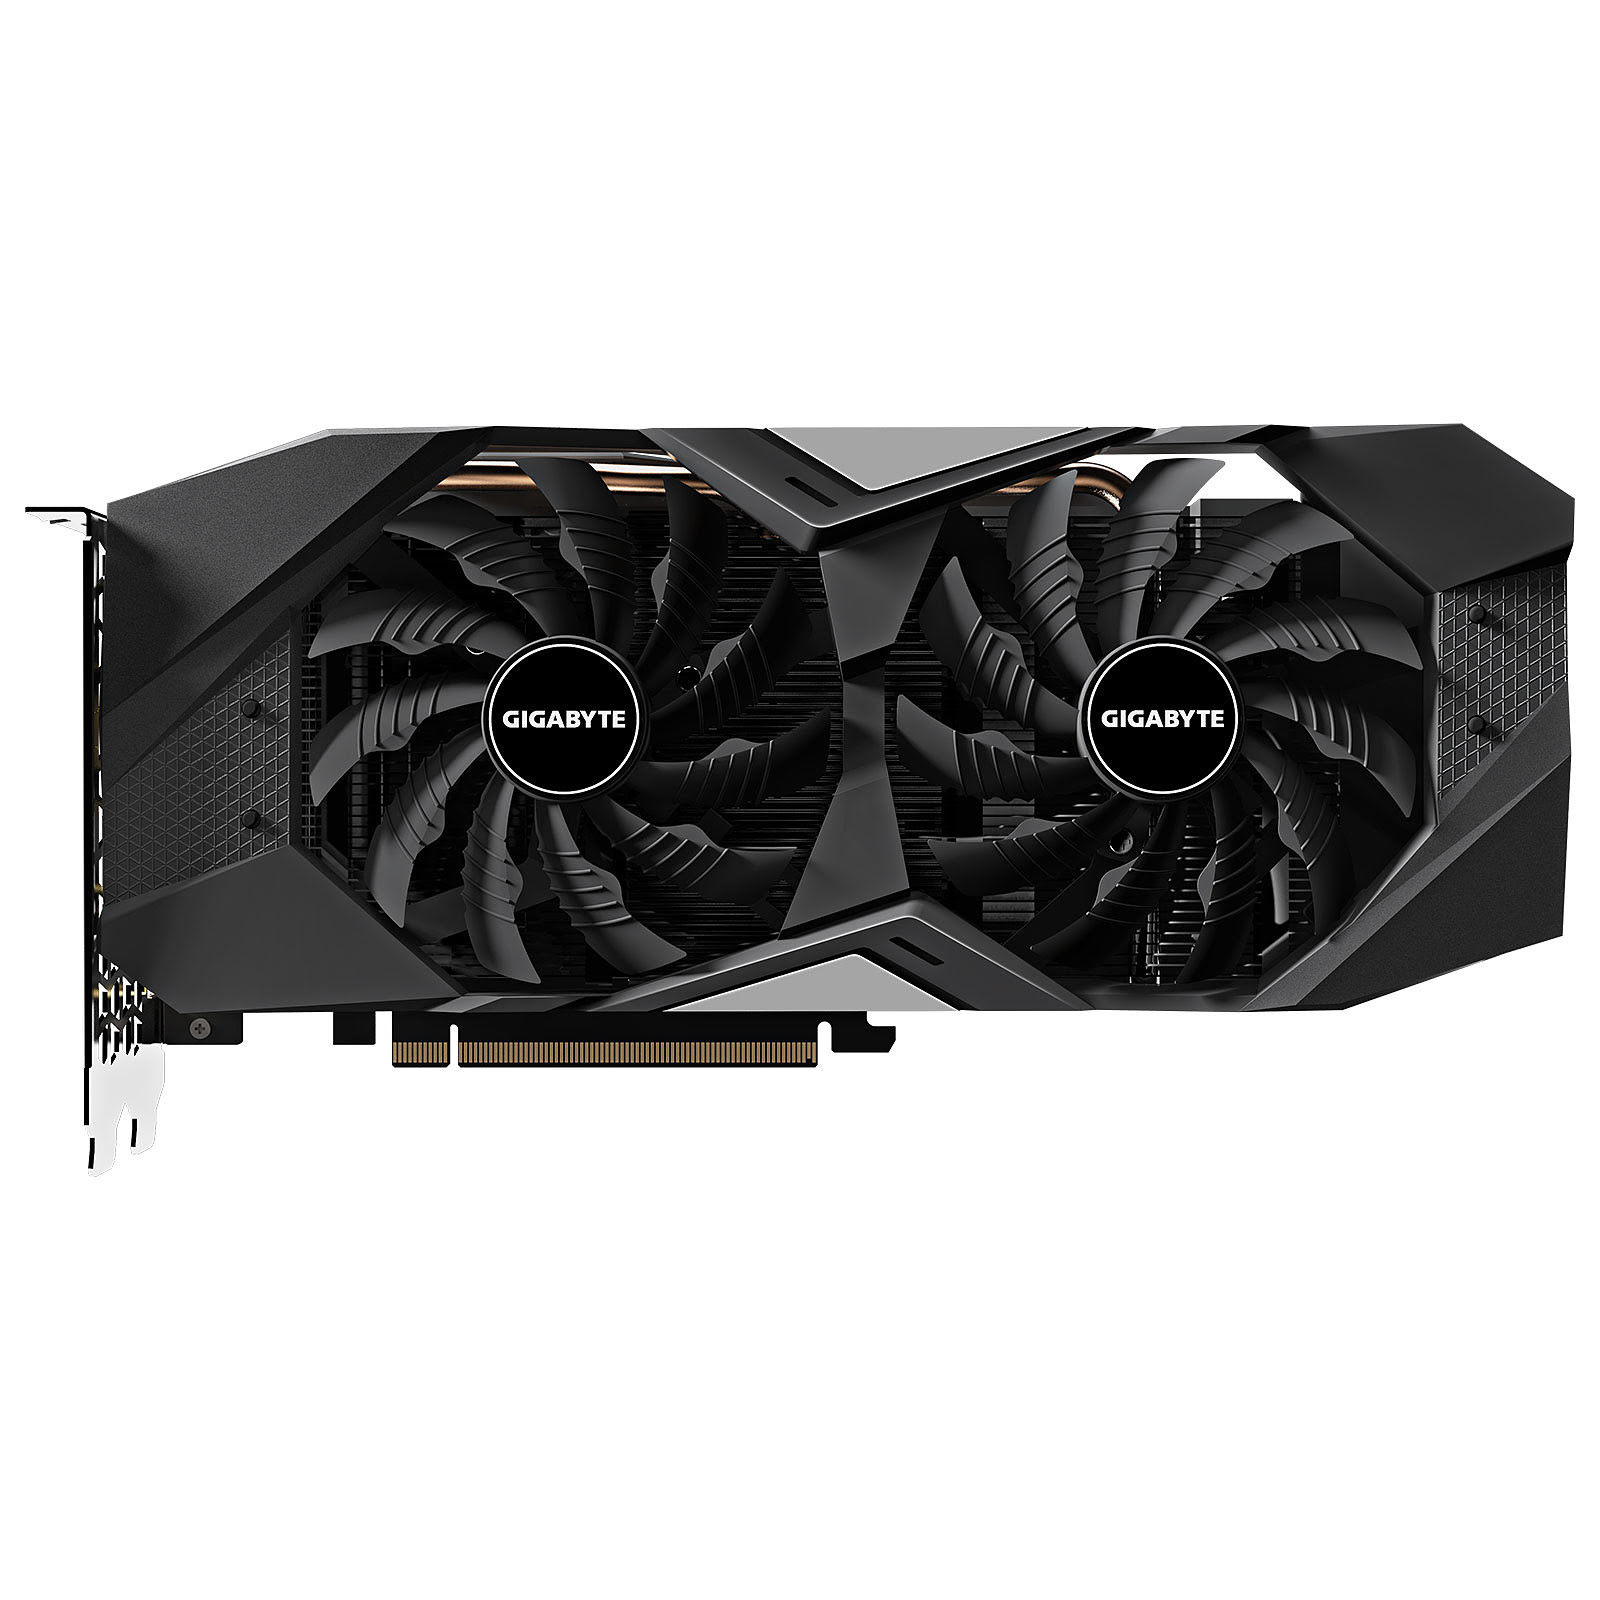 Gigabyte GeForce RTX 2060 SUPER WindForce OC 8G 2.0  (N206SWF2OC-8GD) - Achat / Vente Carte graphique sur Cybertek.fr - 3